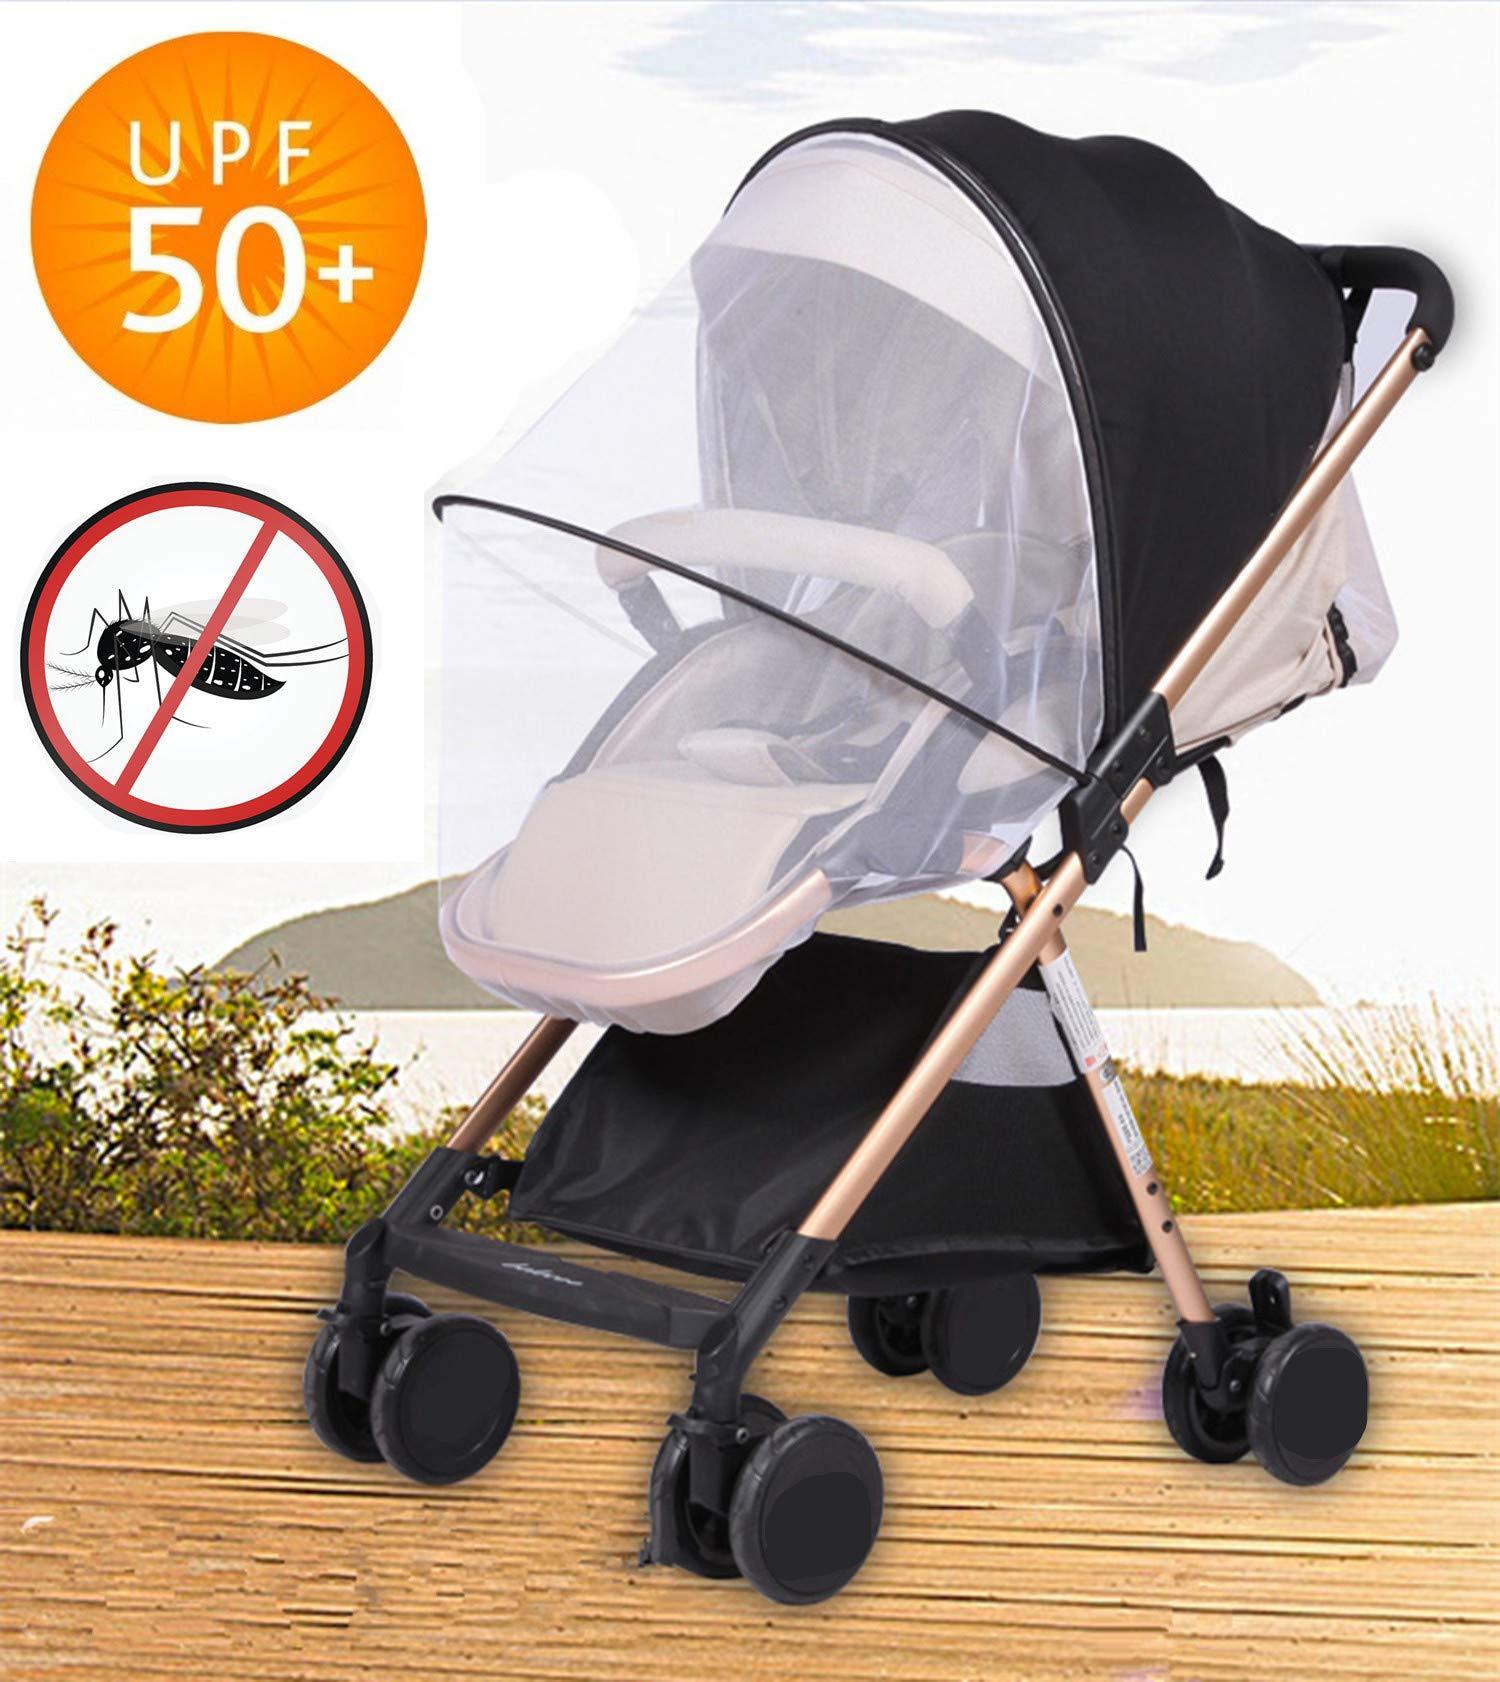 Sun Shade Stroller Car Seat Sunshade Bassinet Playpen Crib Stroller Net-Nice Visiblity and Air Permeability Design (Black + Sunshade) by ZjRight